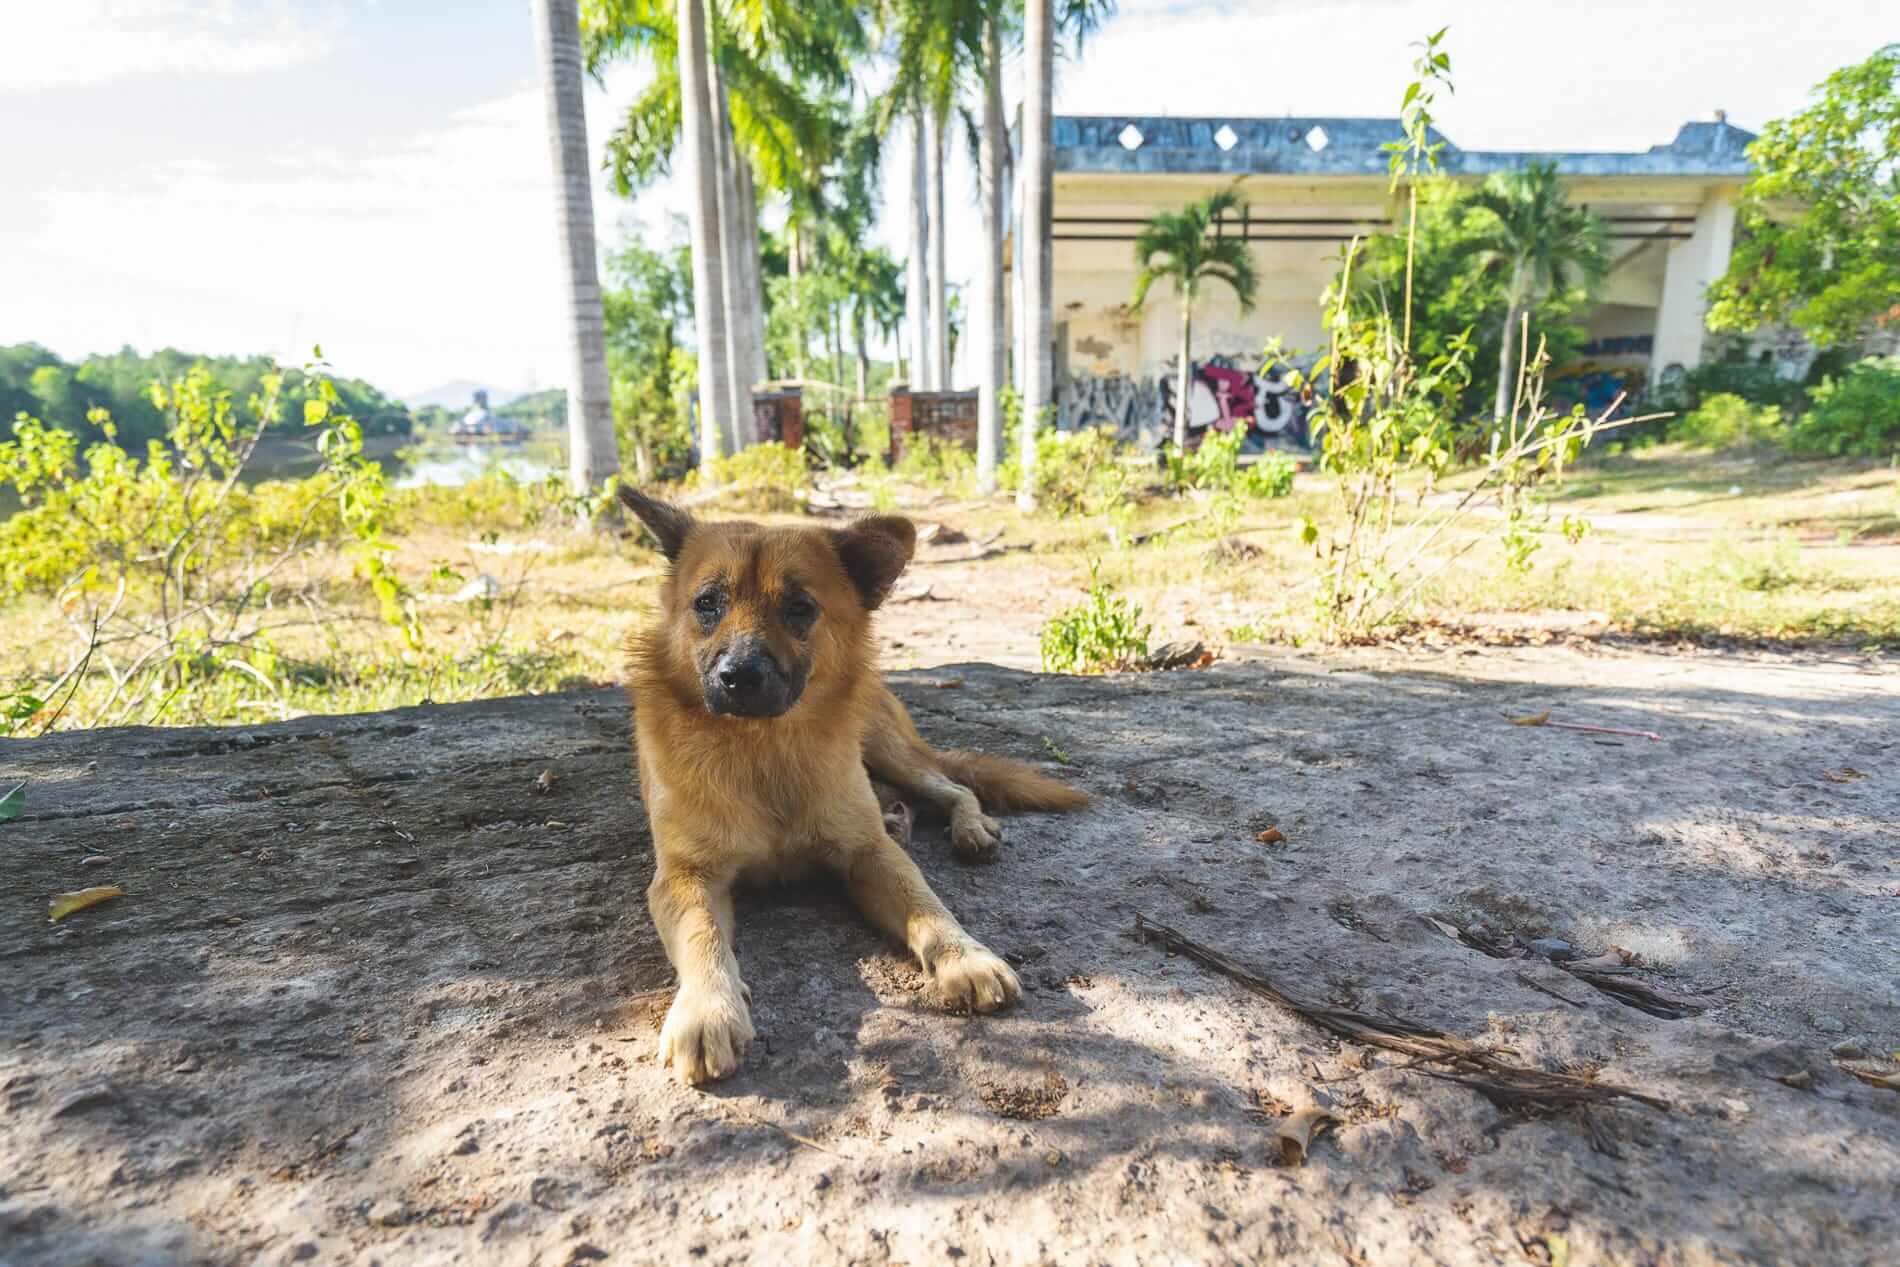 A dog resting at Hue's Abandoned Water Park